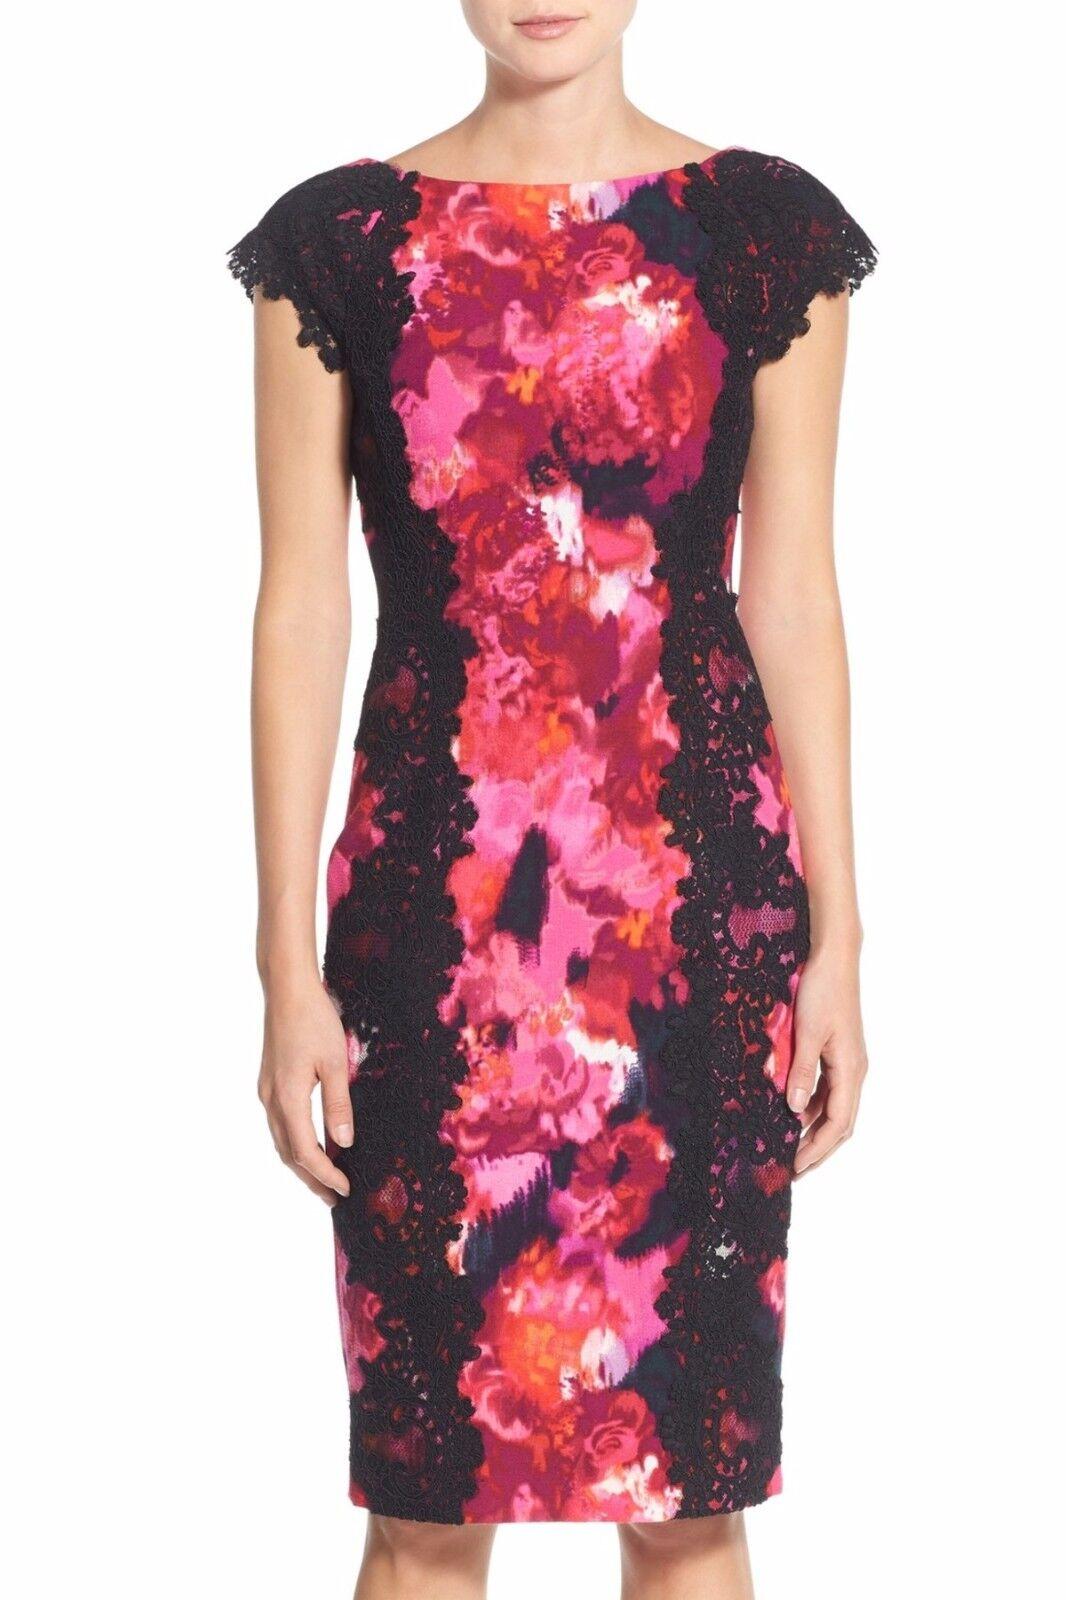 Maggy London Lace & Crepe Sheath Dress  ( size 8)